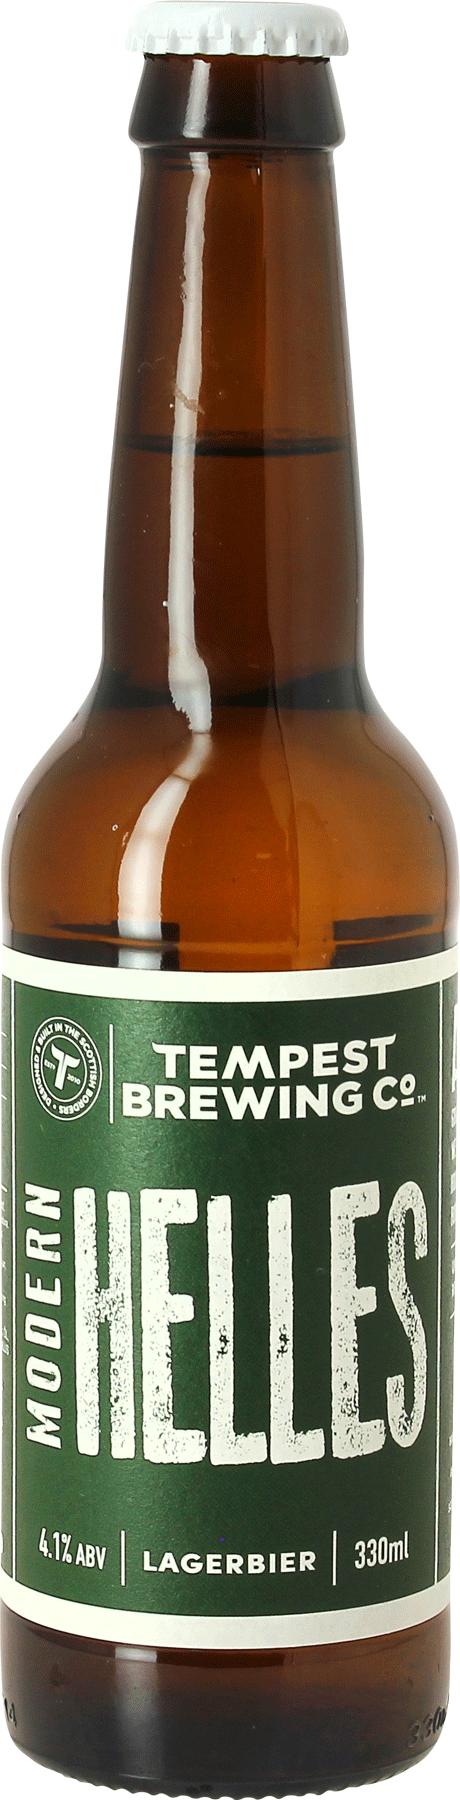 Tempest Modern Helles Lagerbier